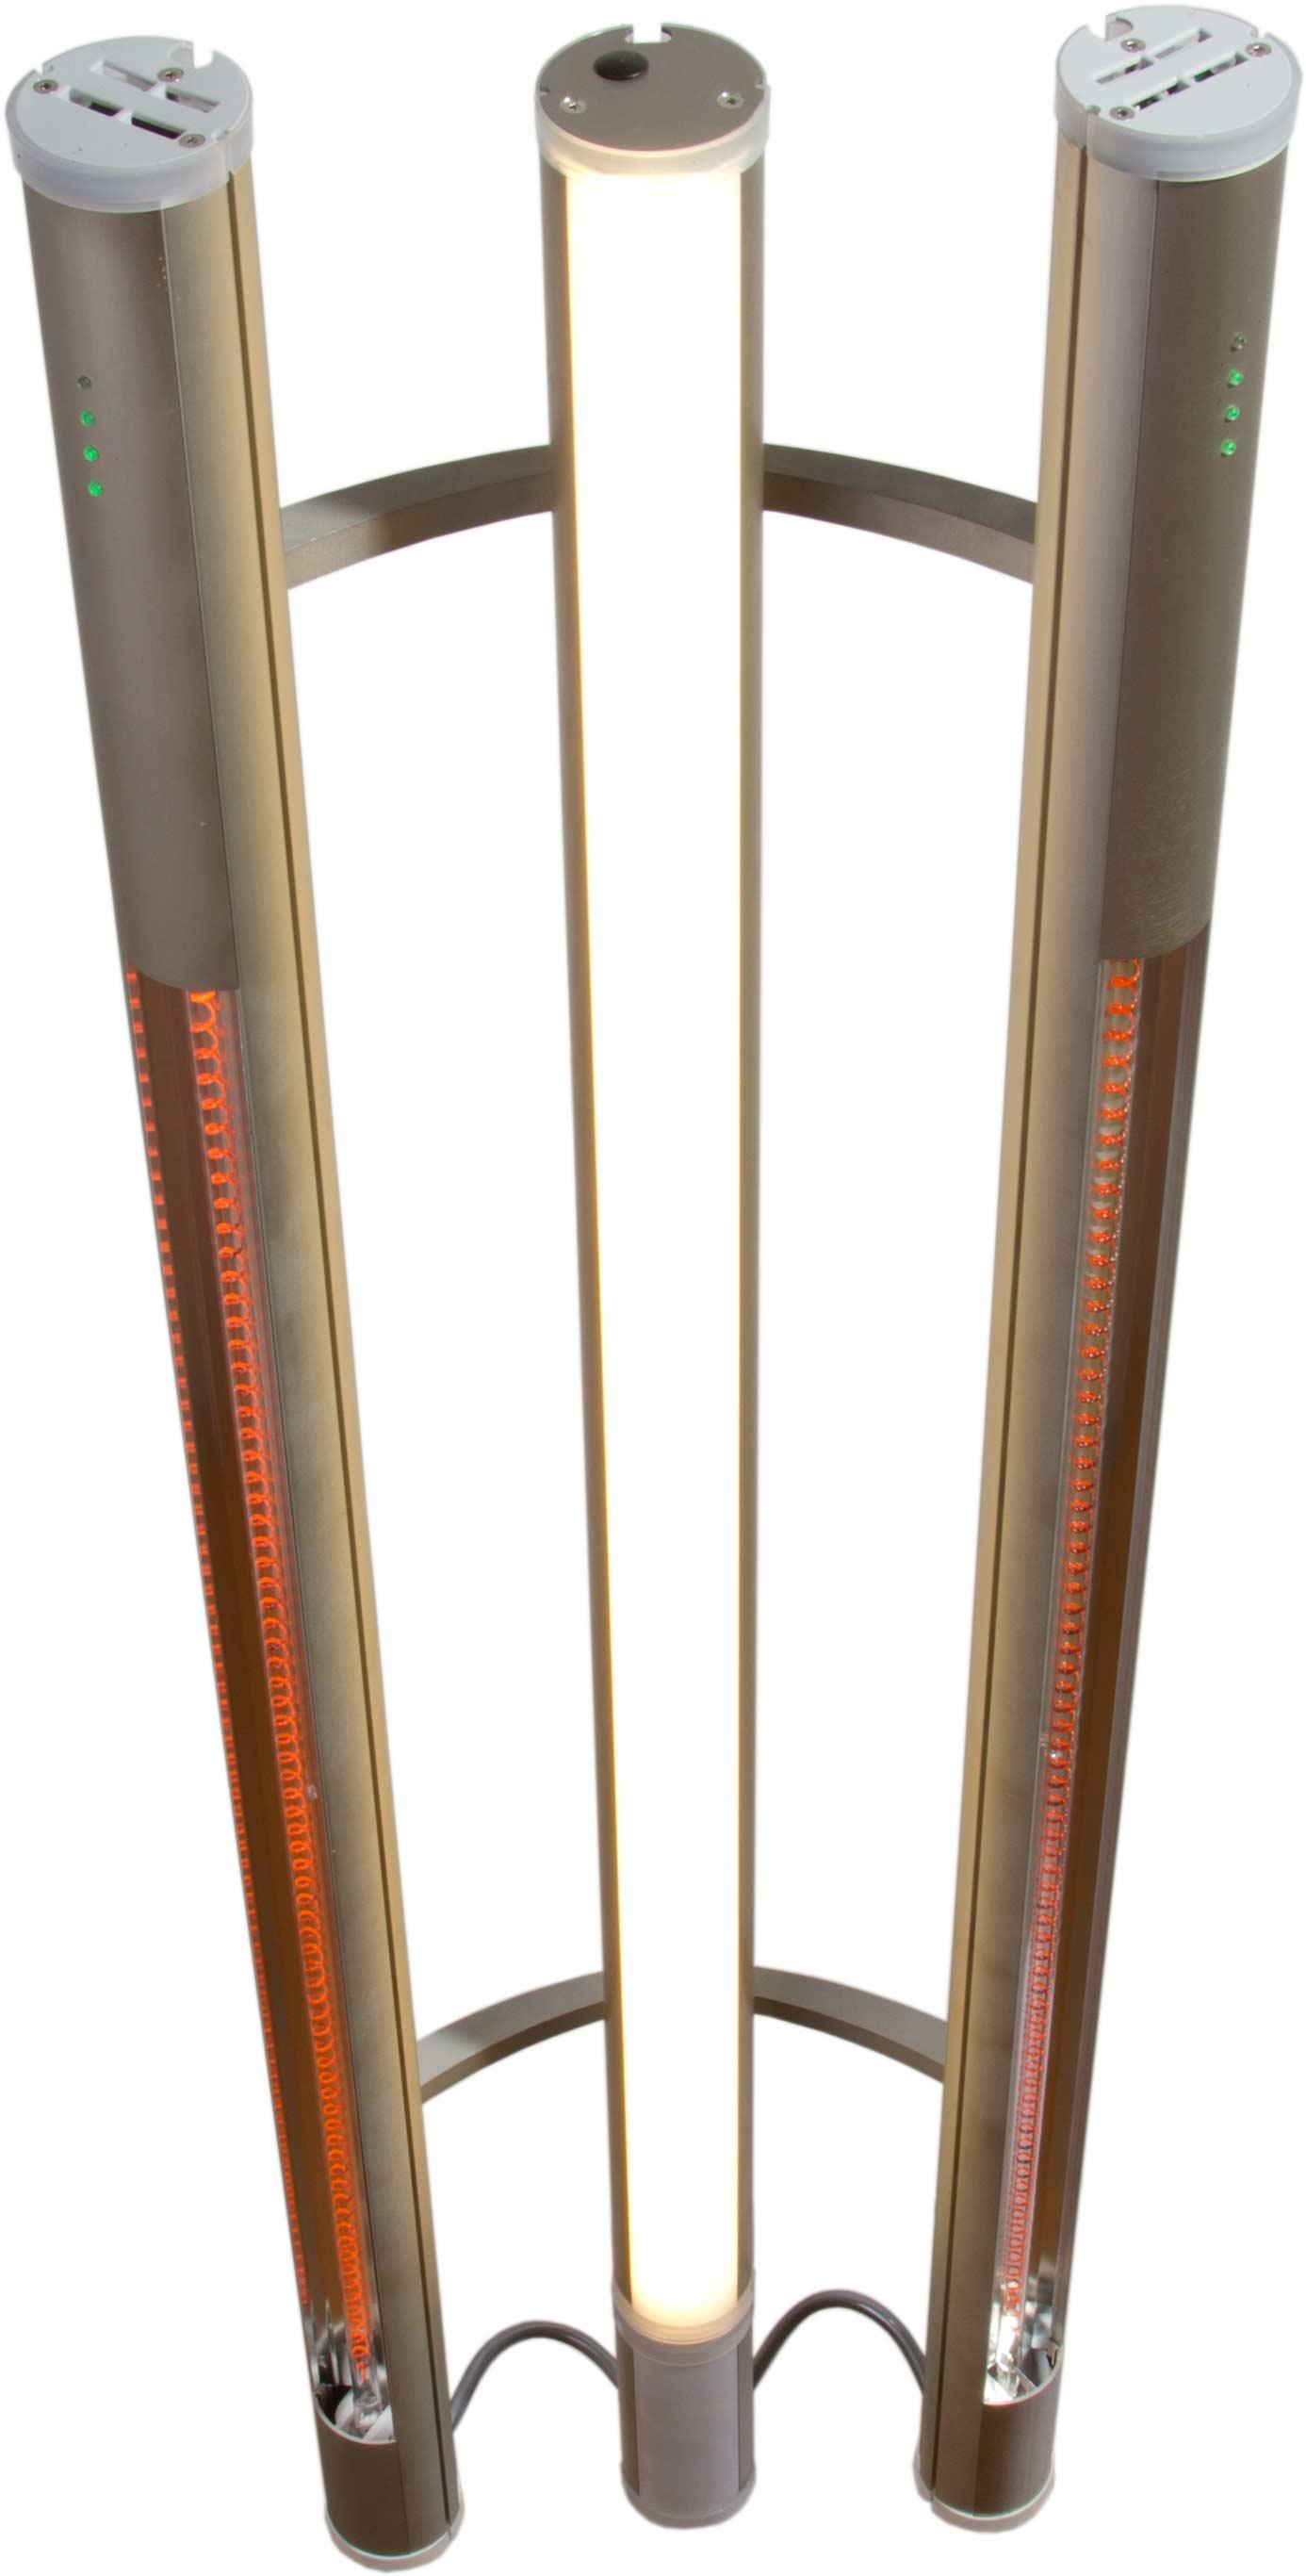 ExtremeLine Carbonstrahler HEAT TUBE 3er-Kombination 900W